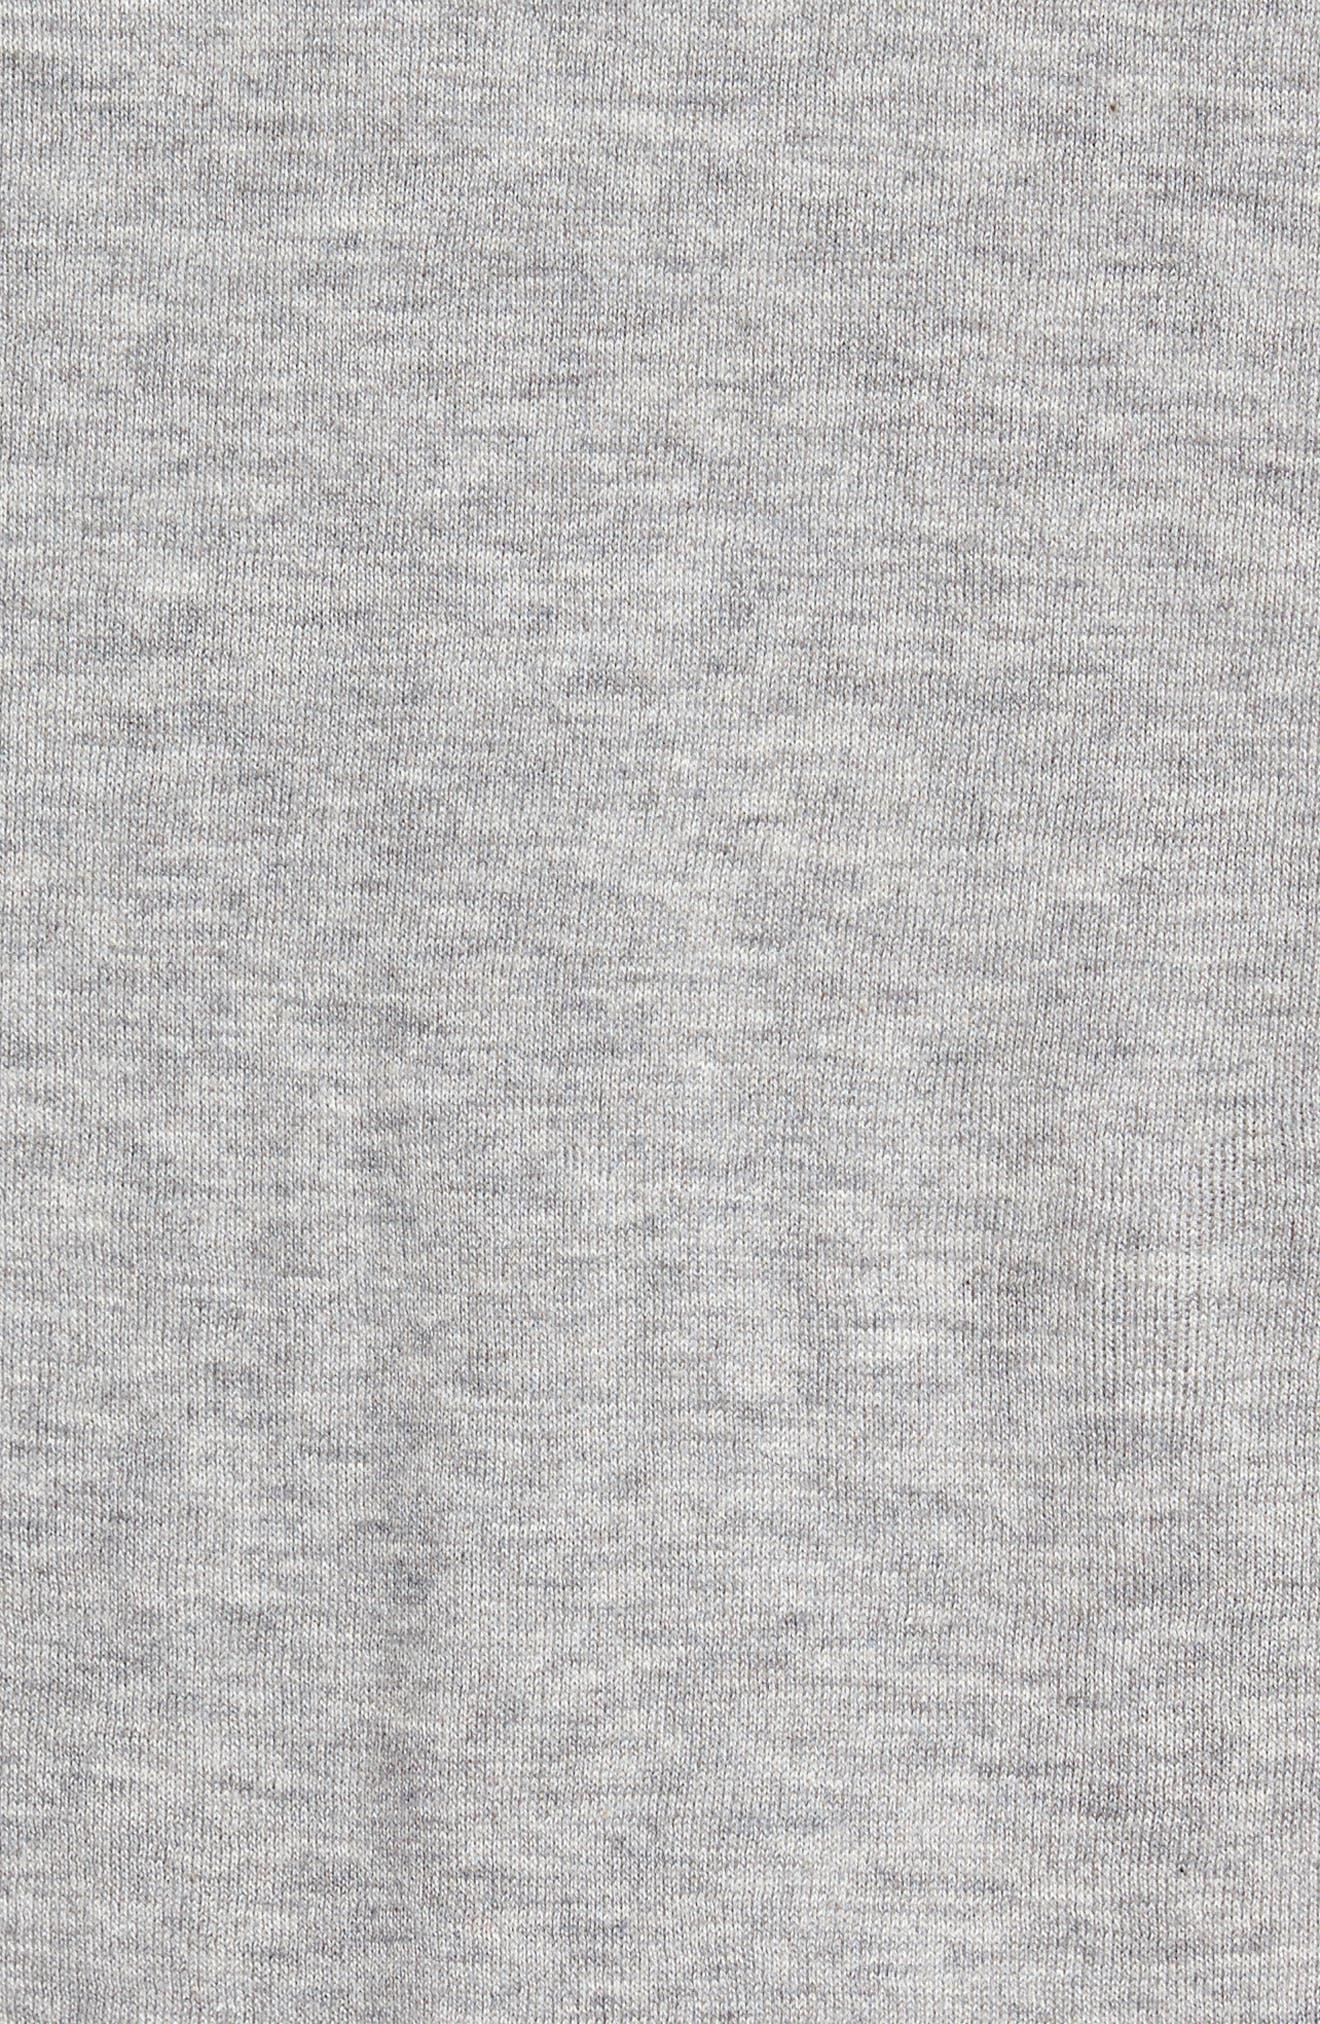 Reversible Long Sleeve T-Shirt,                             Alternate thumbnail 5, color,                             020